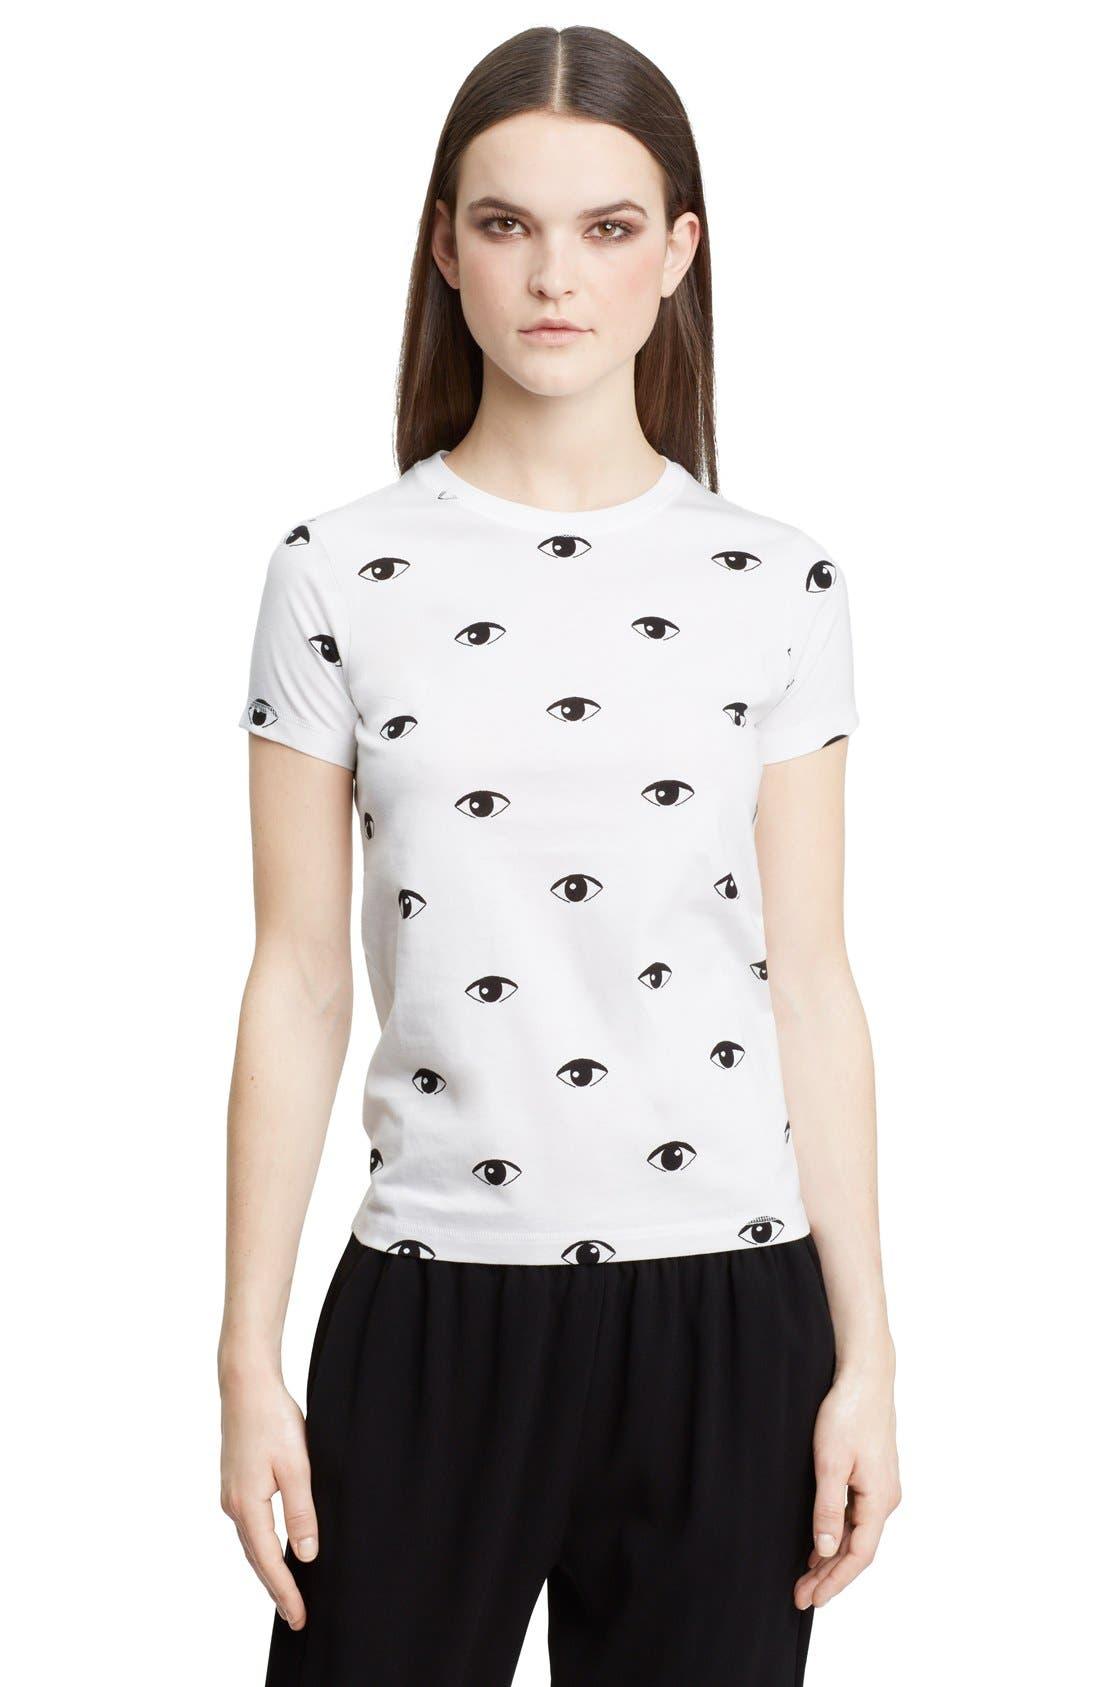 Main Image - KENZO Eye Print Cotton T-Shirt